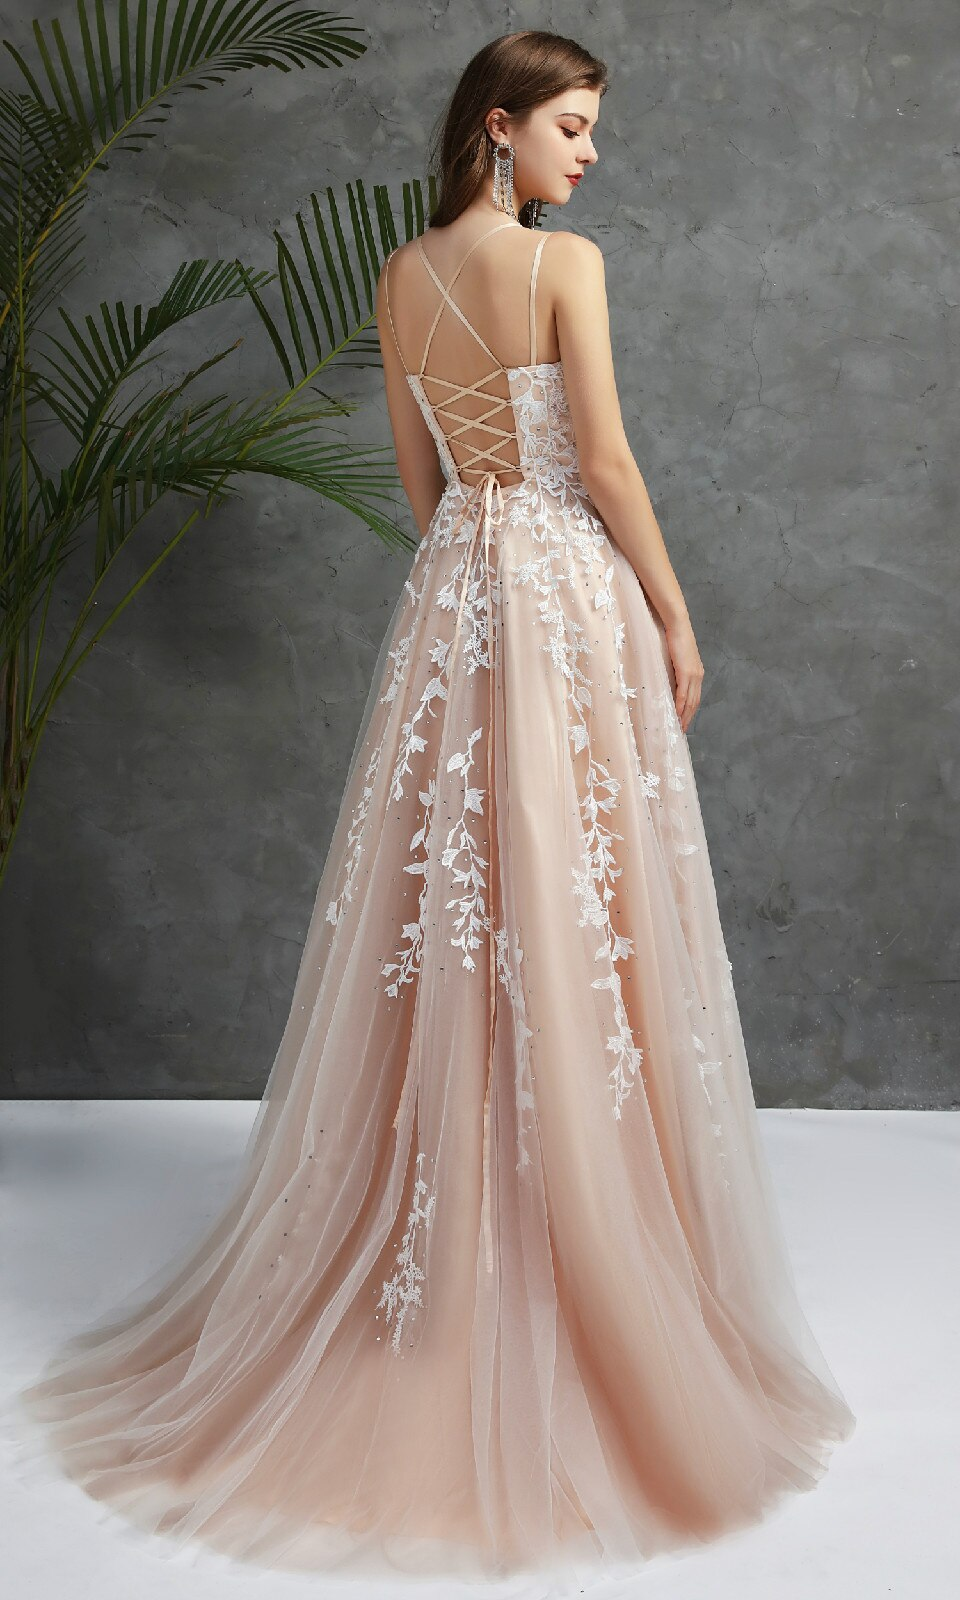 Women's Lace Prom Dress Long Spaghetti Straps Beaded Sleeveless Formal Evening Party Gowns Vestido Robe De Bal Festa Gala Jurken